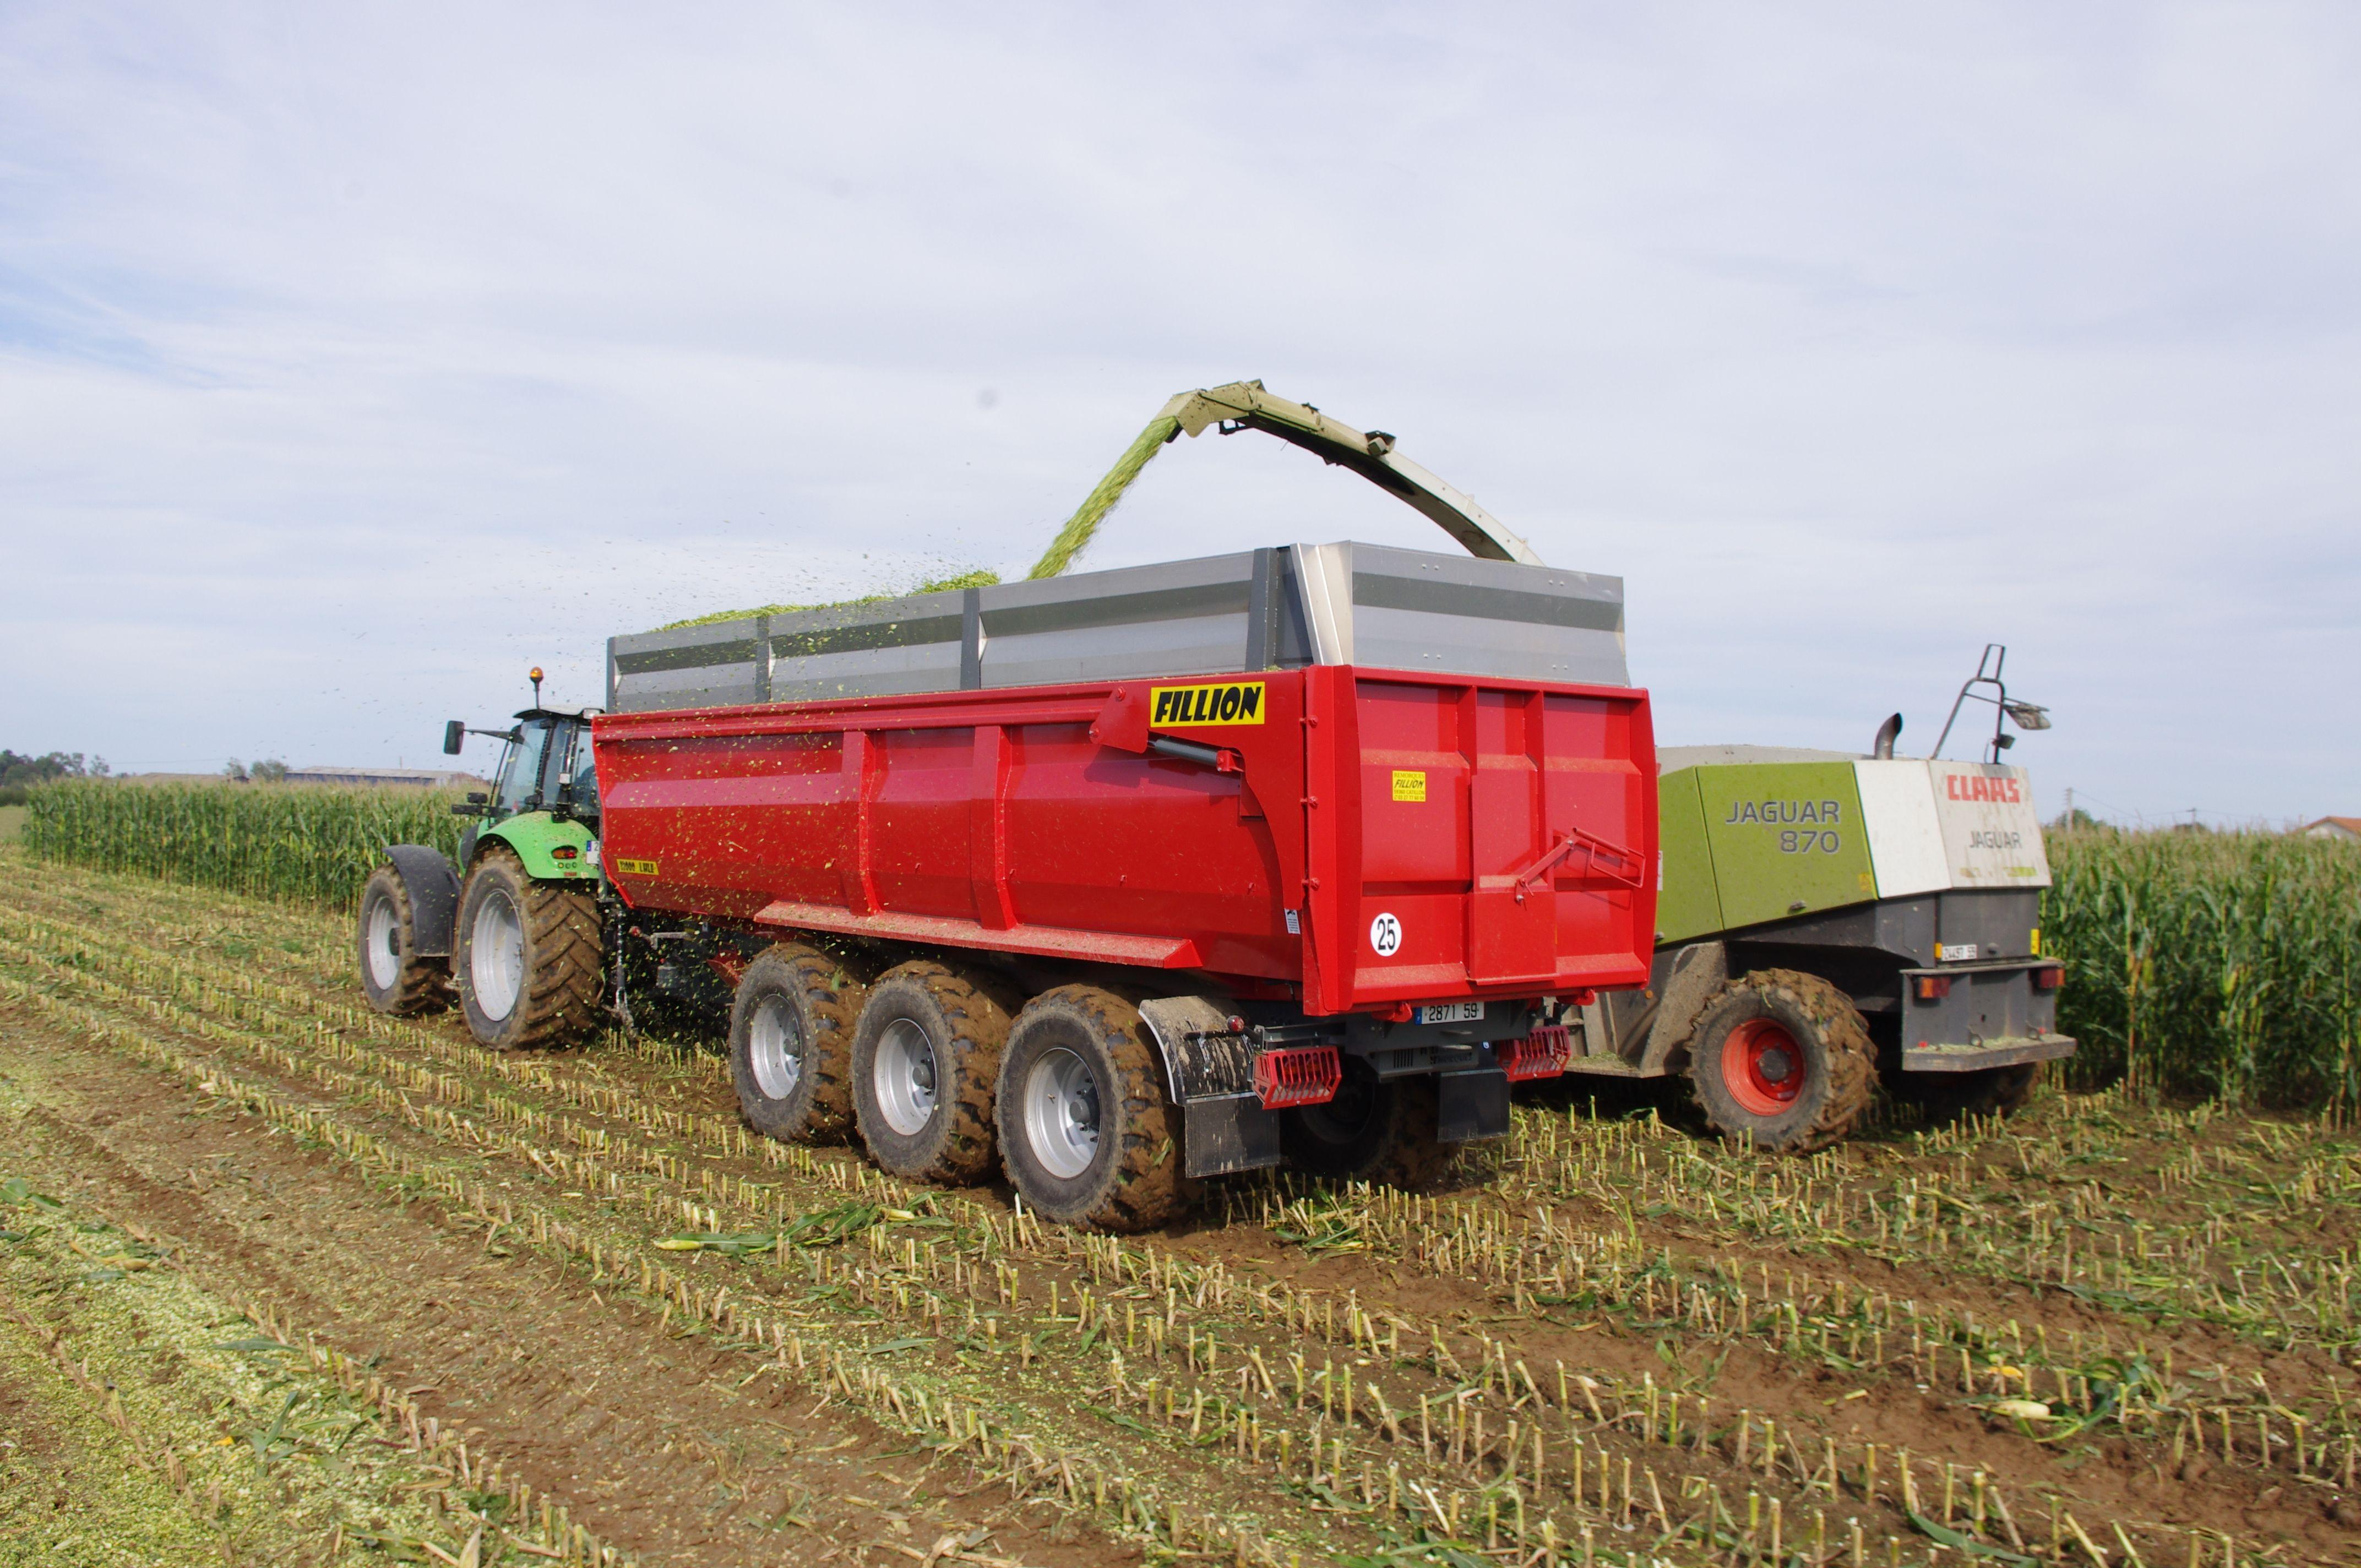 Remorque agricole Fillion 2